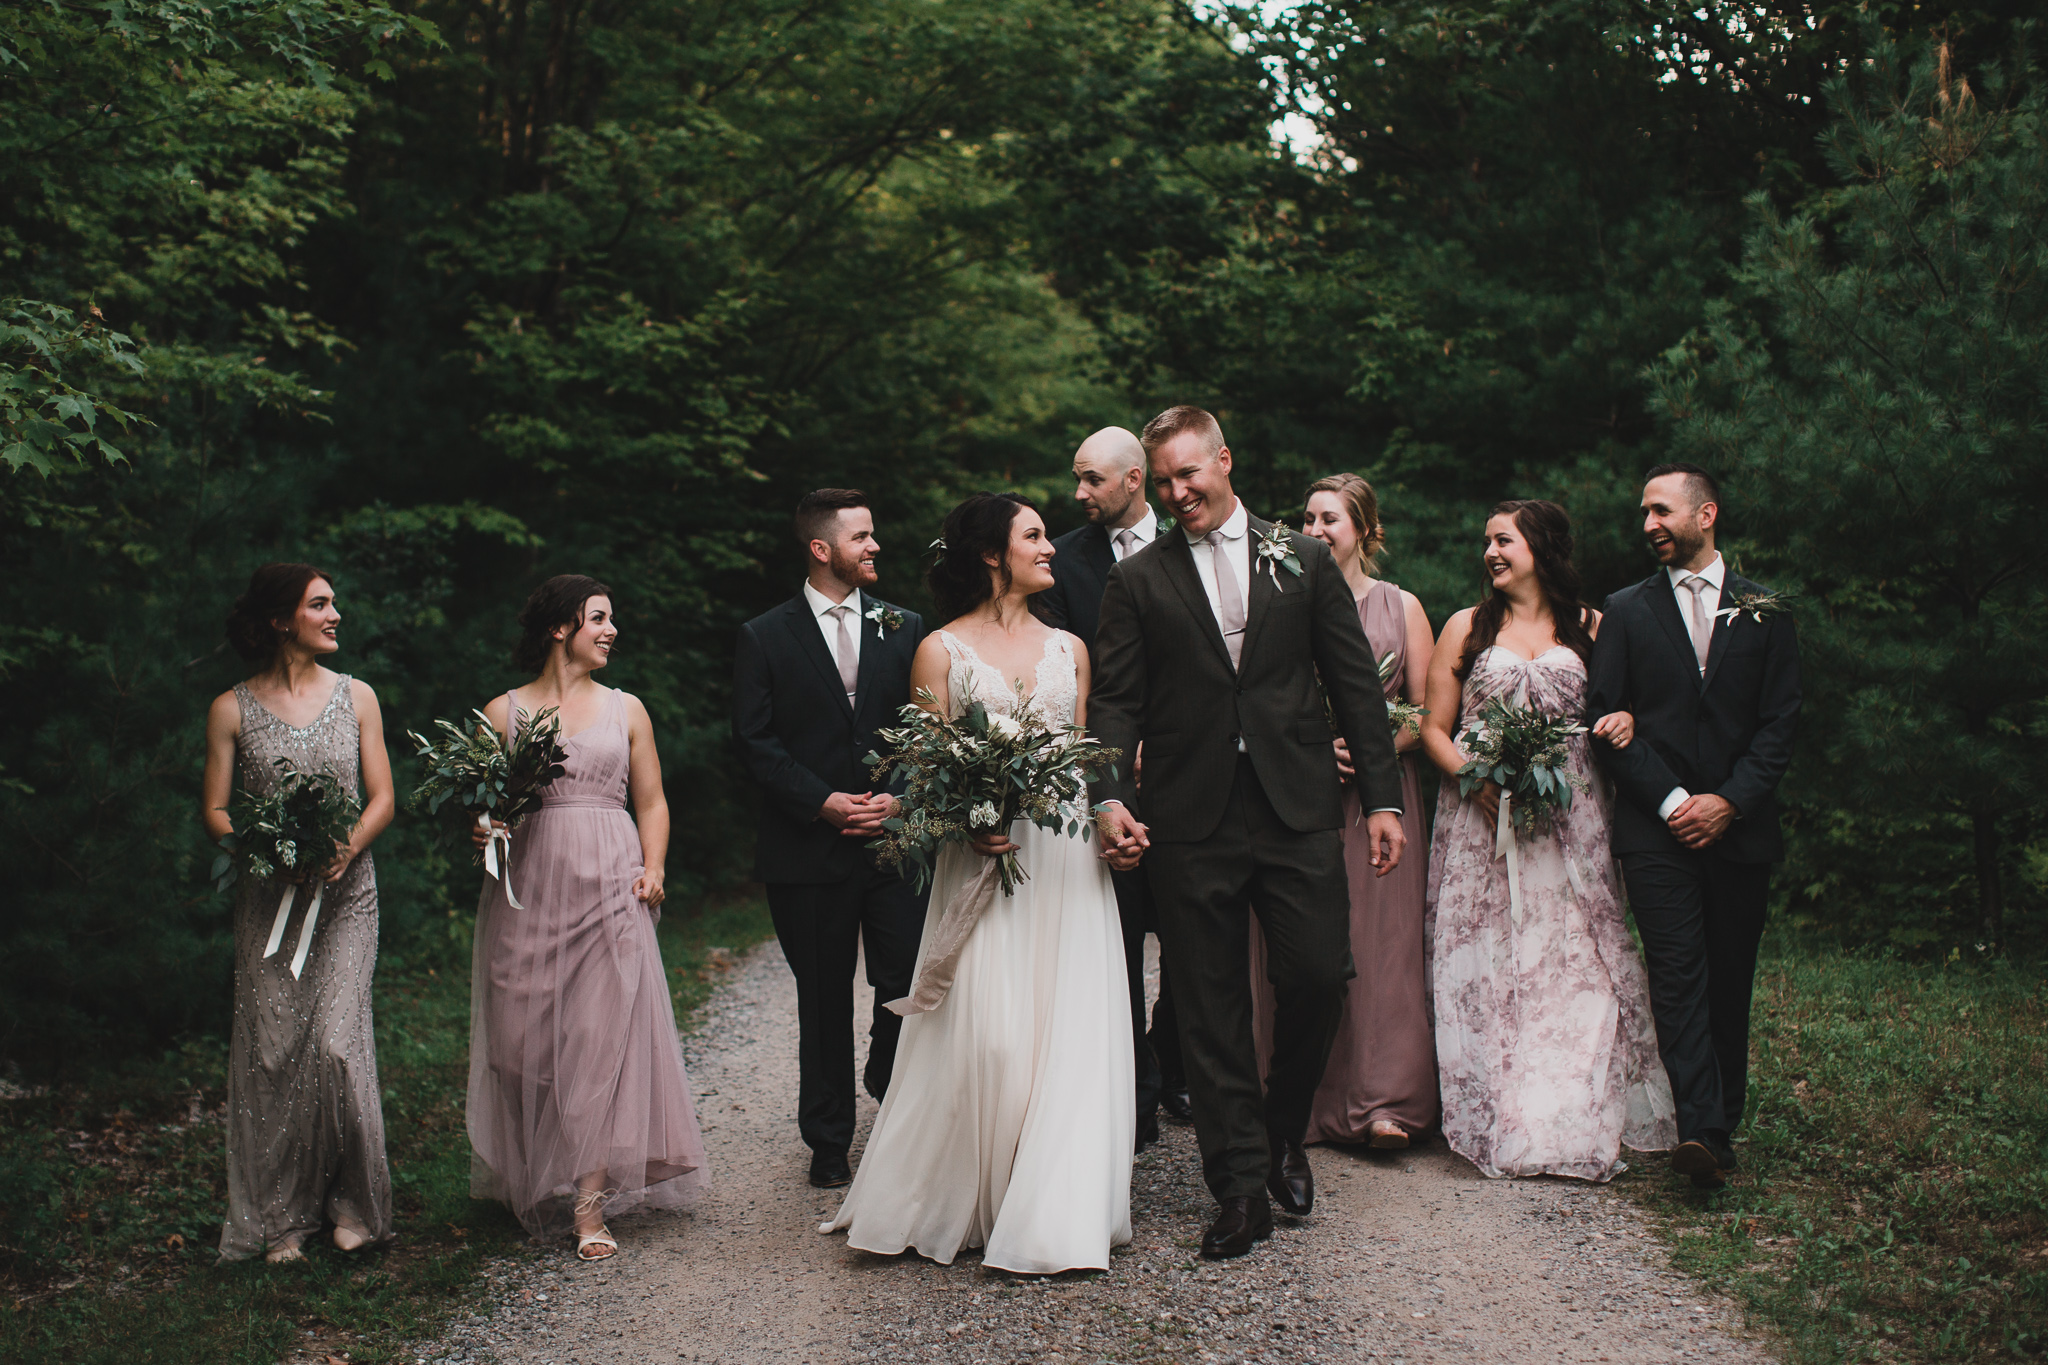 Candid style group wedding photo